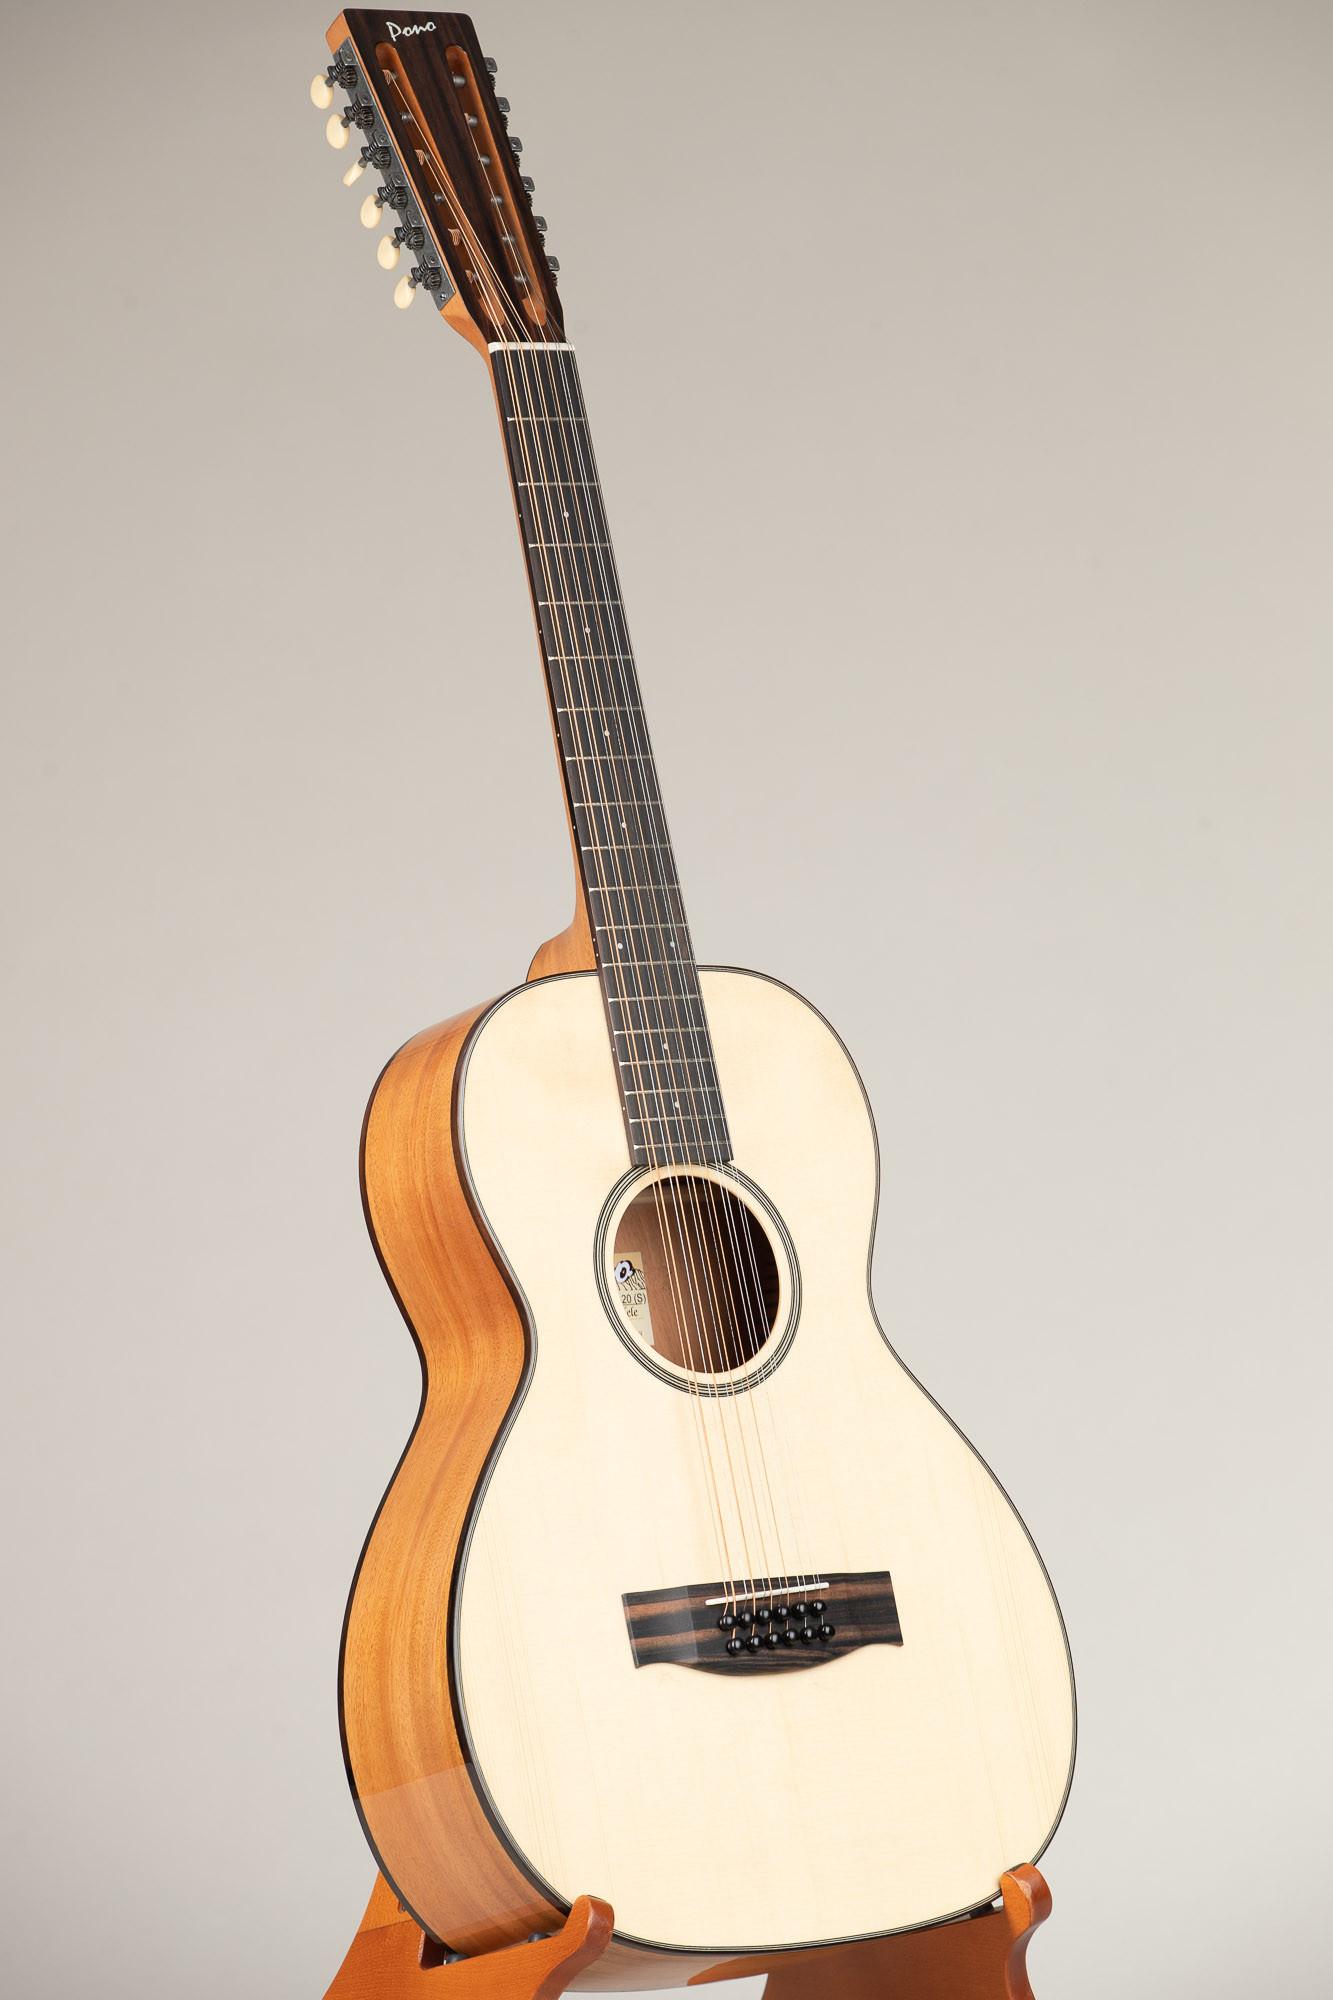 Pono Spruce Top Mahogany OO 12 String Guitar (OO-20-12(S) 3218)